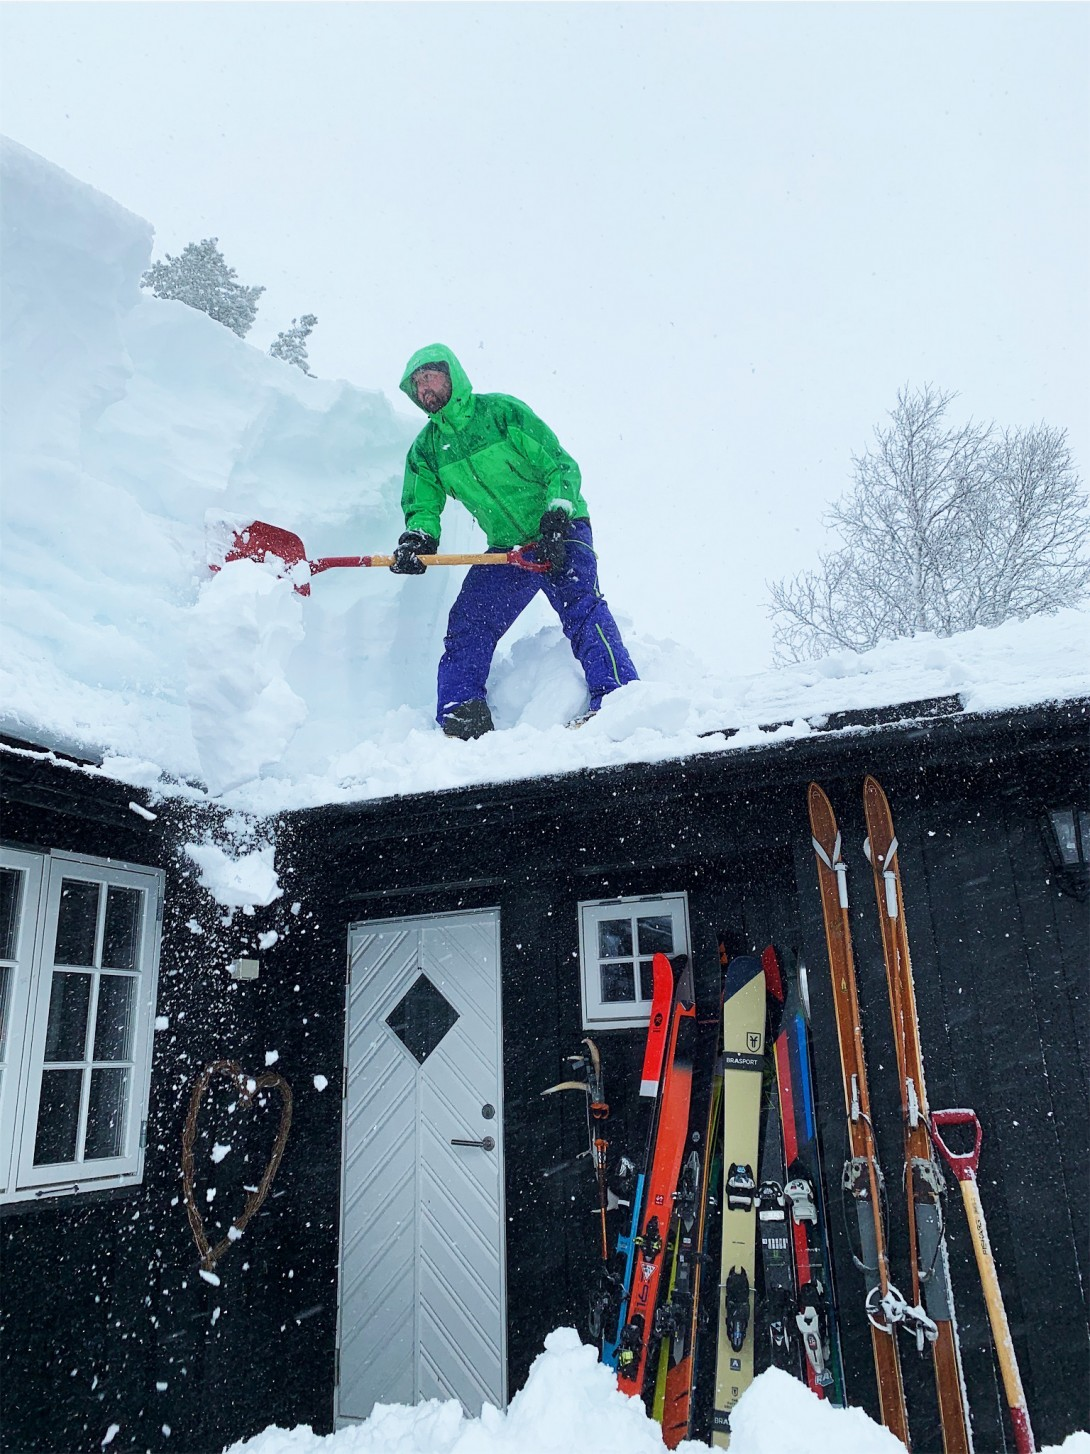 Sigbjørn Justnæs er i gang med å fjerne snø fra taket, han passer på at rømningsveien ikke blir blokkert.